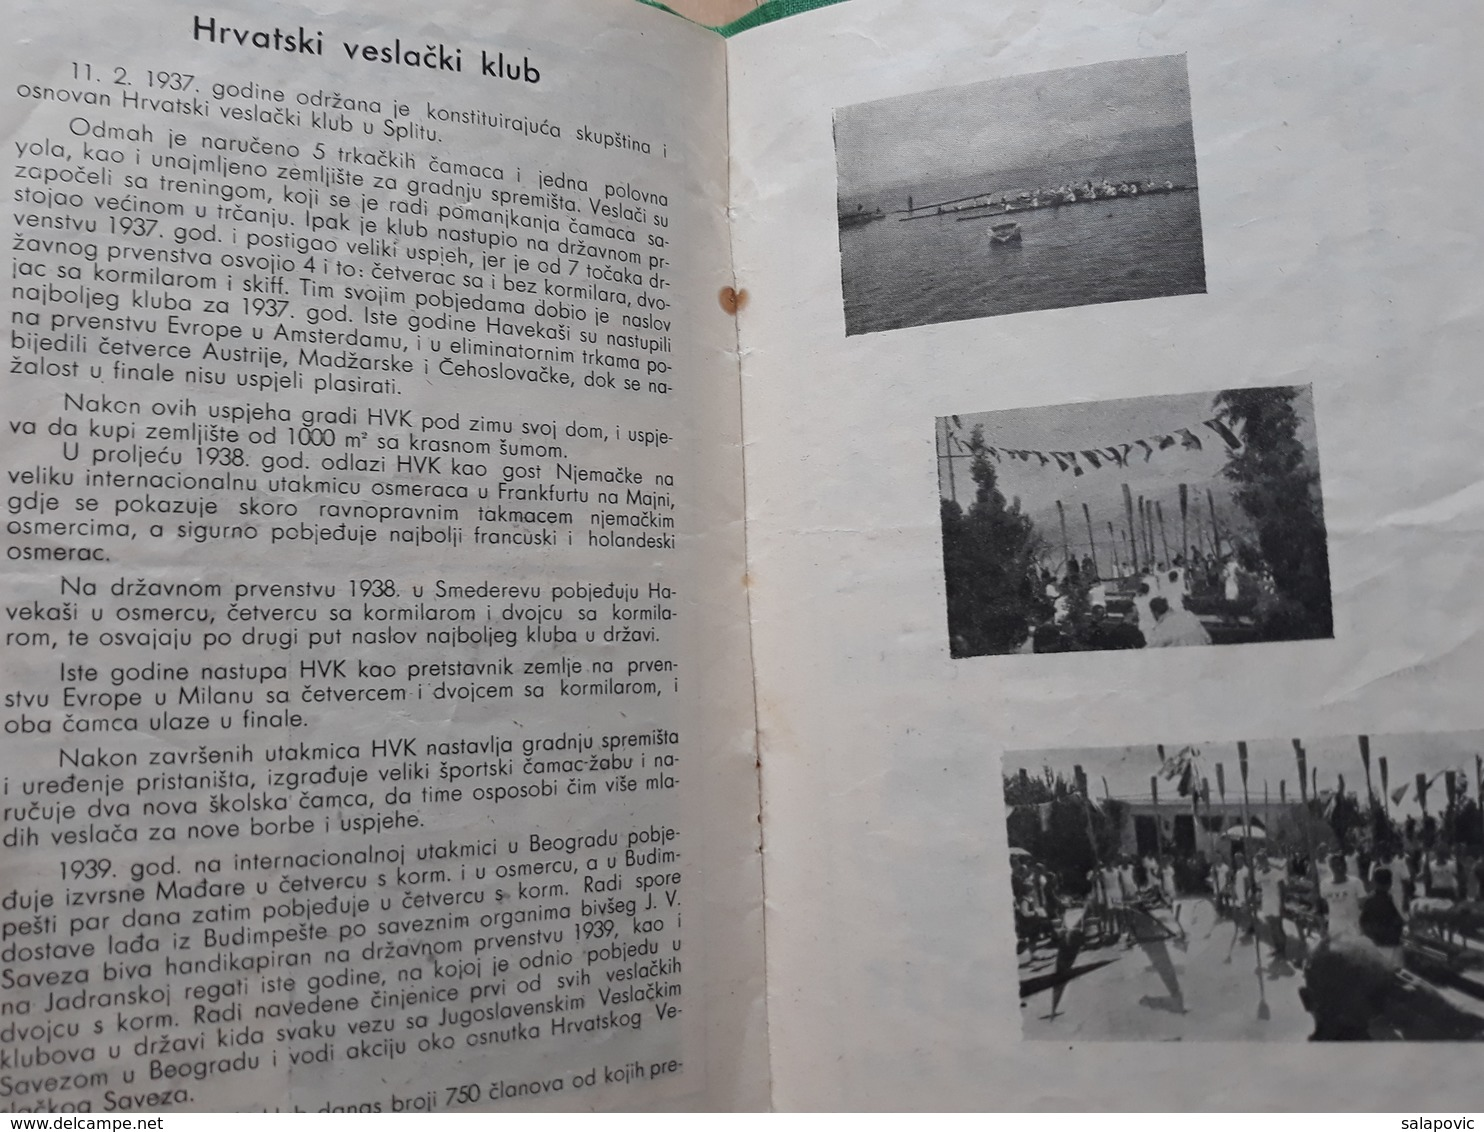 PROGRAM VESLACKIH UTAKMICA ZA PRVENSTVO JADRANA 1940 SPLIT, JADRANSKA REGATA   Rrrare - Remo